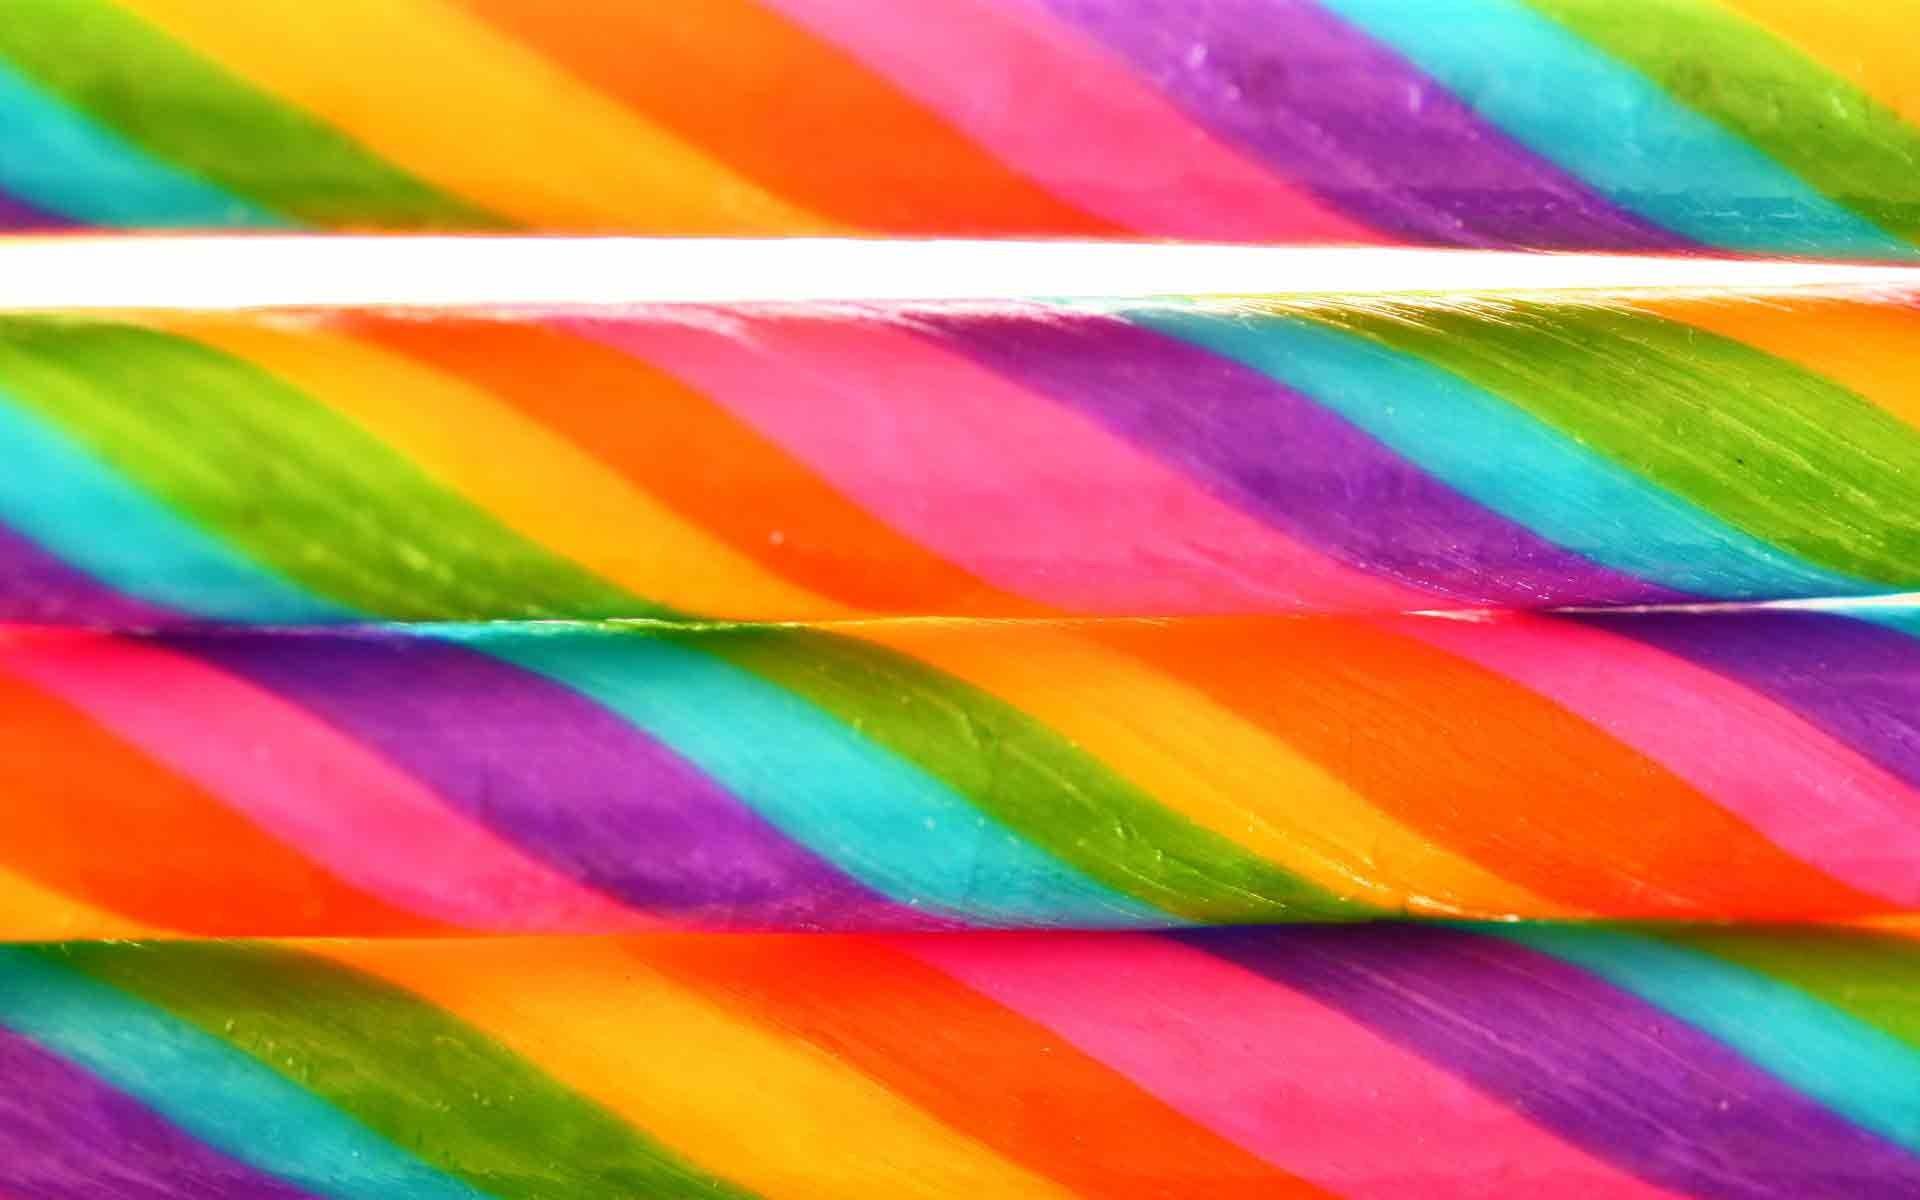 Res: 1920x1200, Lollipop Candy Wallpaper High Definition 53527